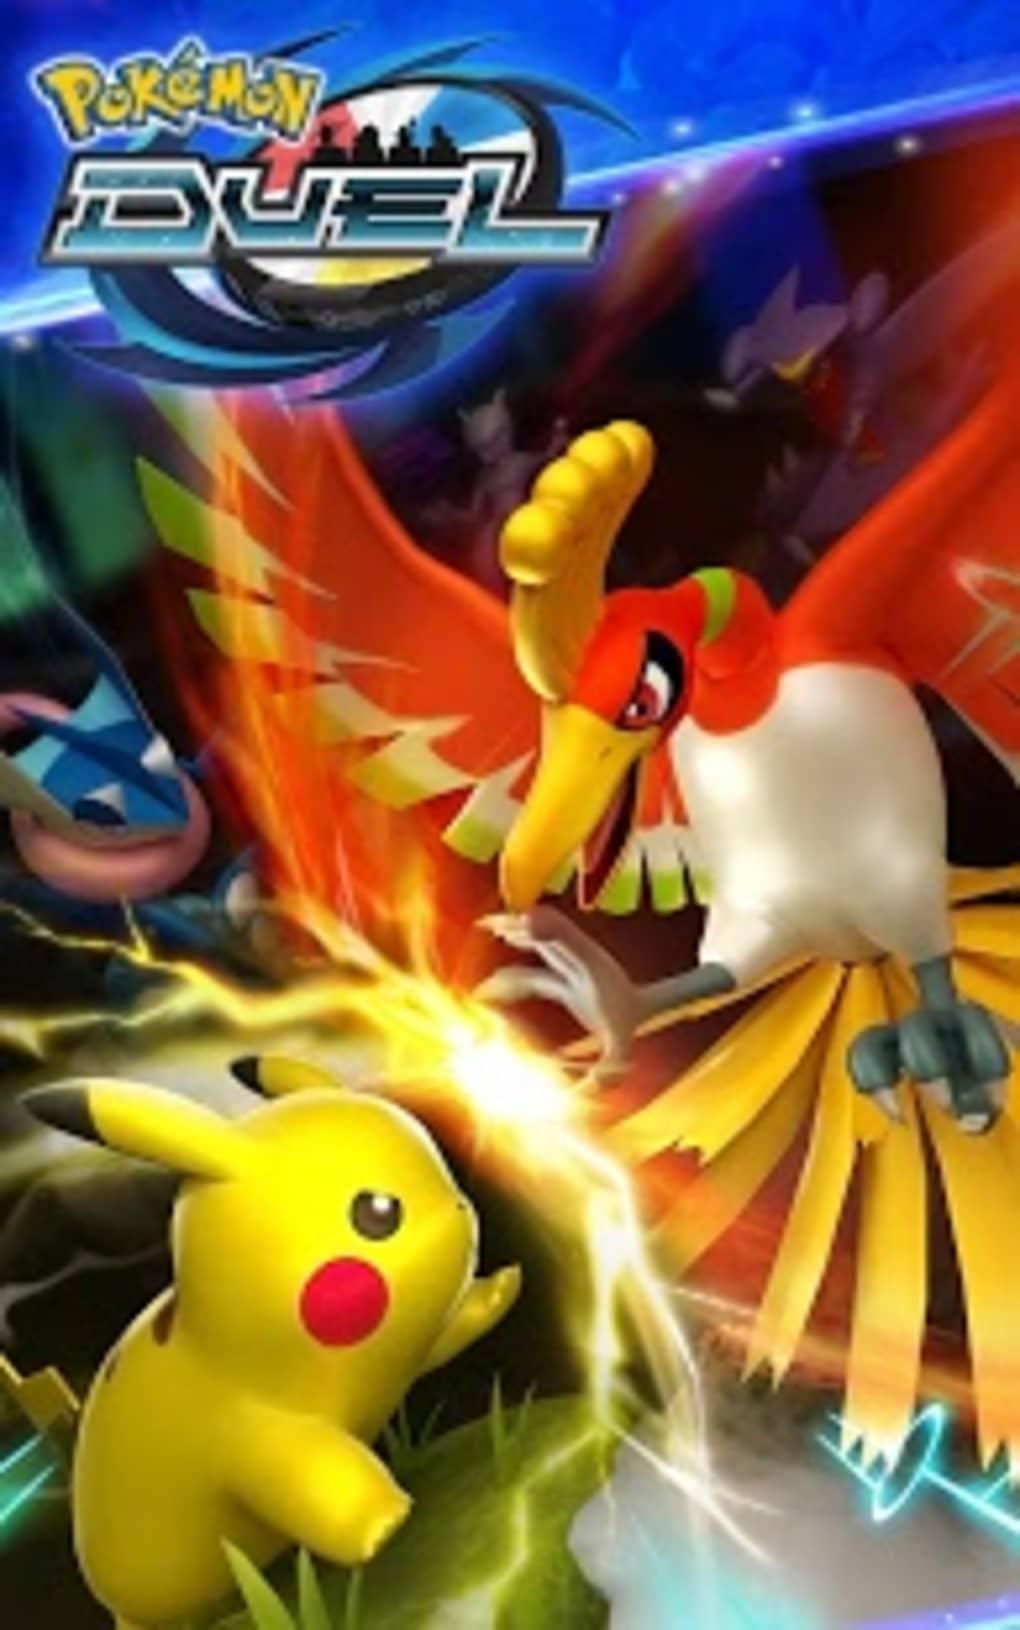 pokemon offline games for pc free download full version